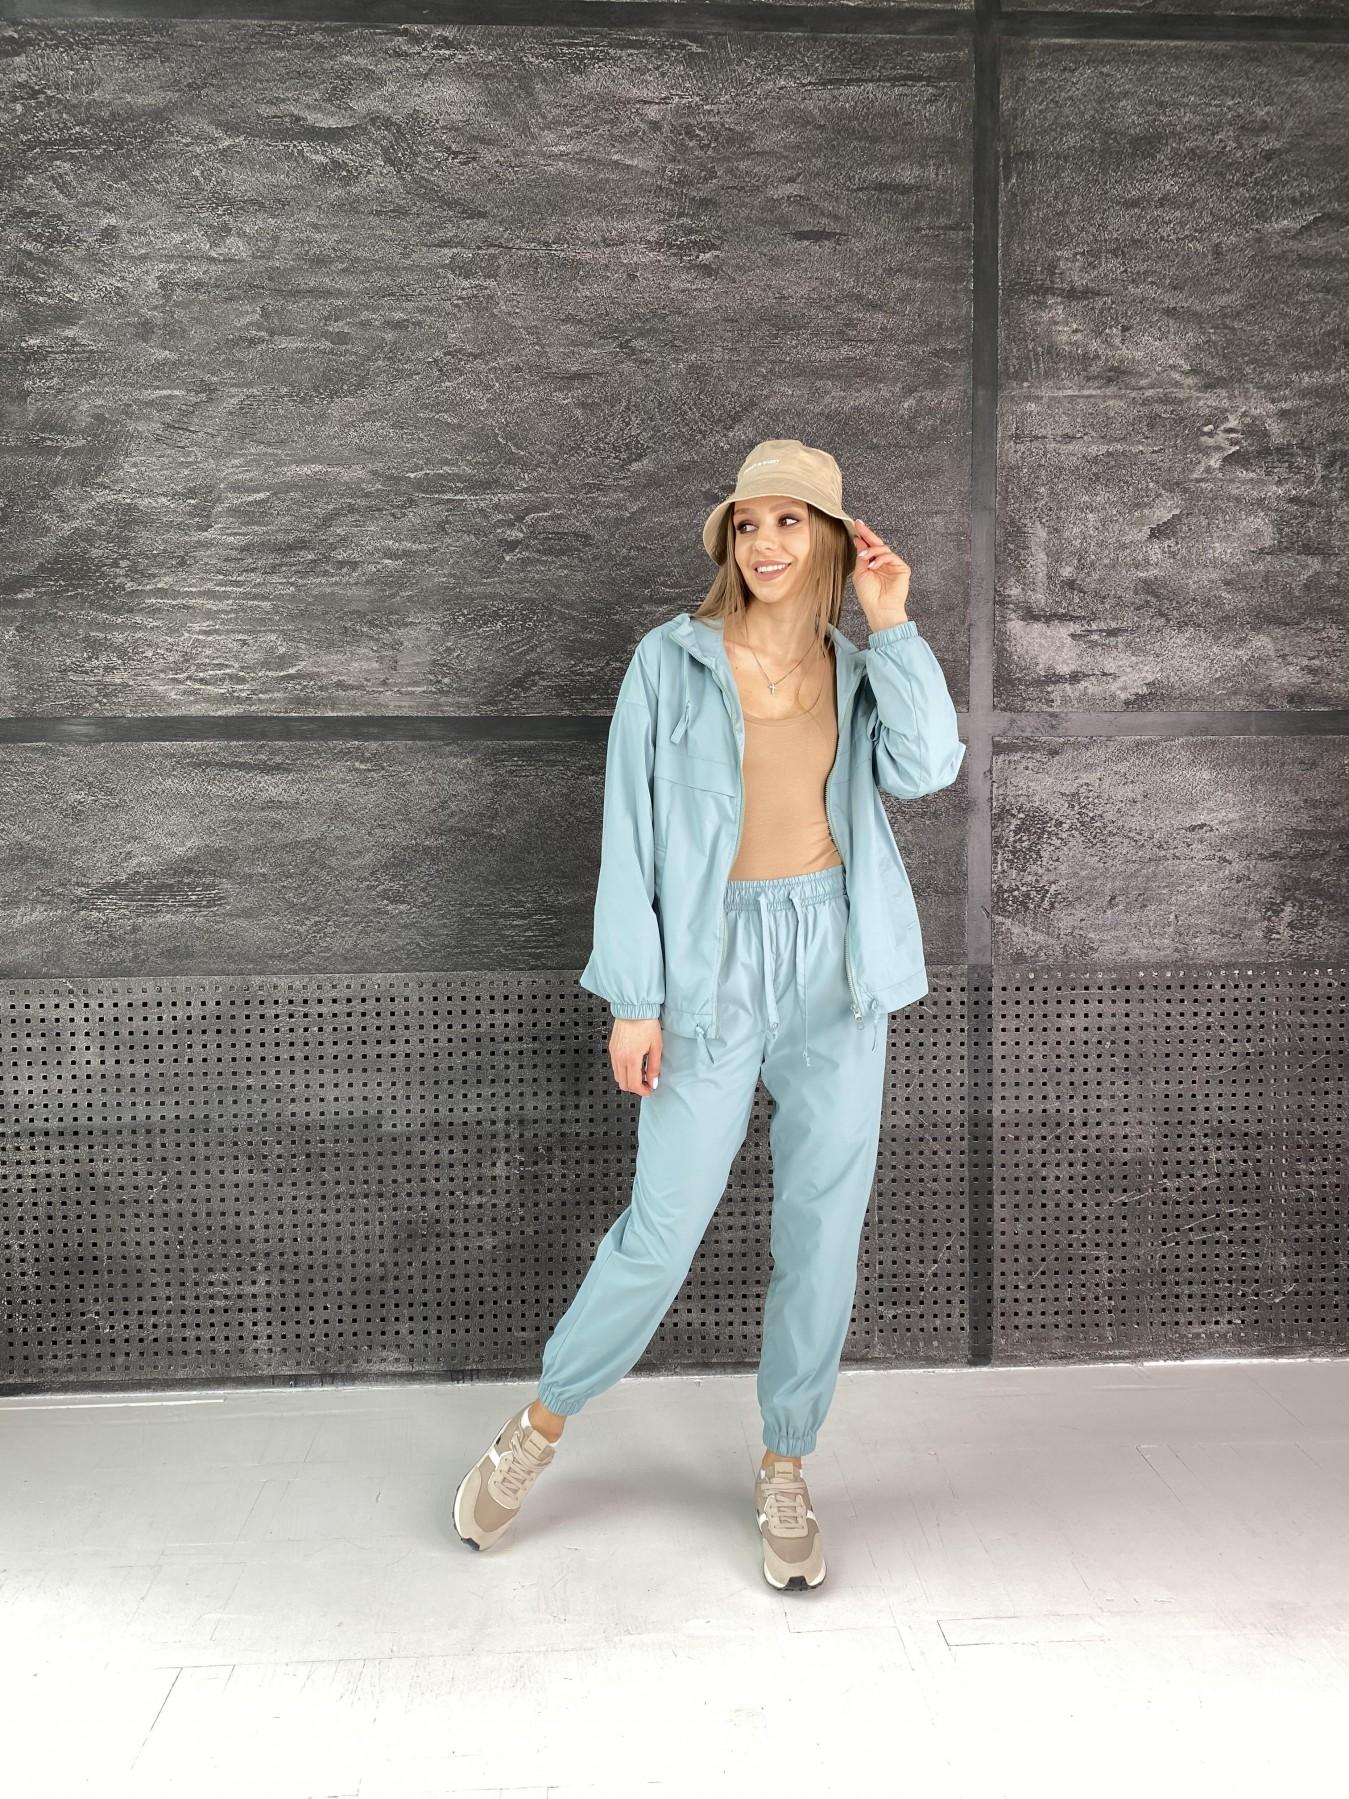 Фит костюм  из плащевой ткани Astra 11052 АРТ. 47536 Цвет: Олива - фото 2, интернет магазин tm-modus.ru